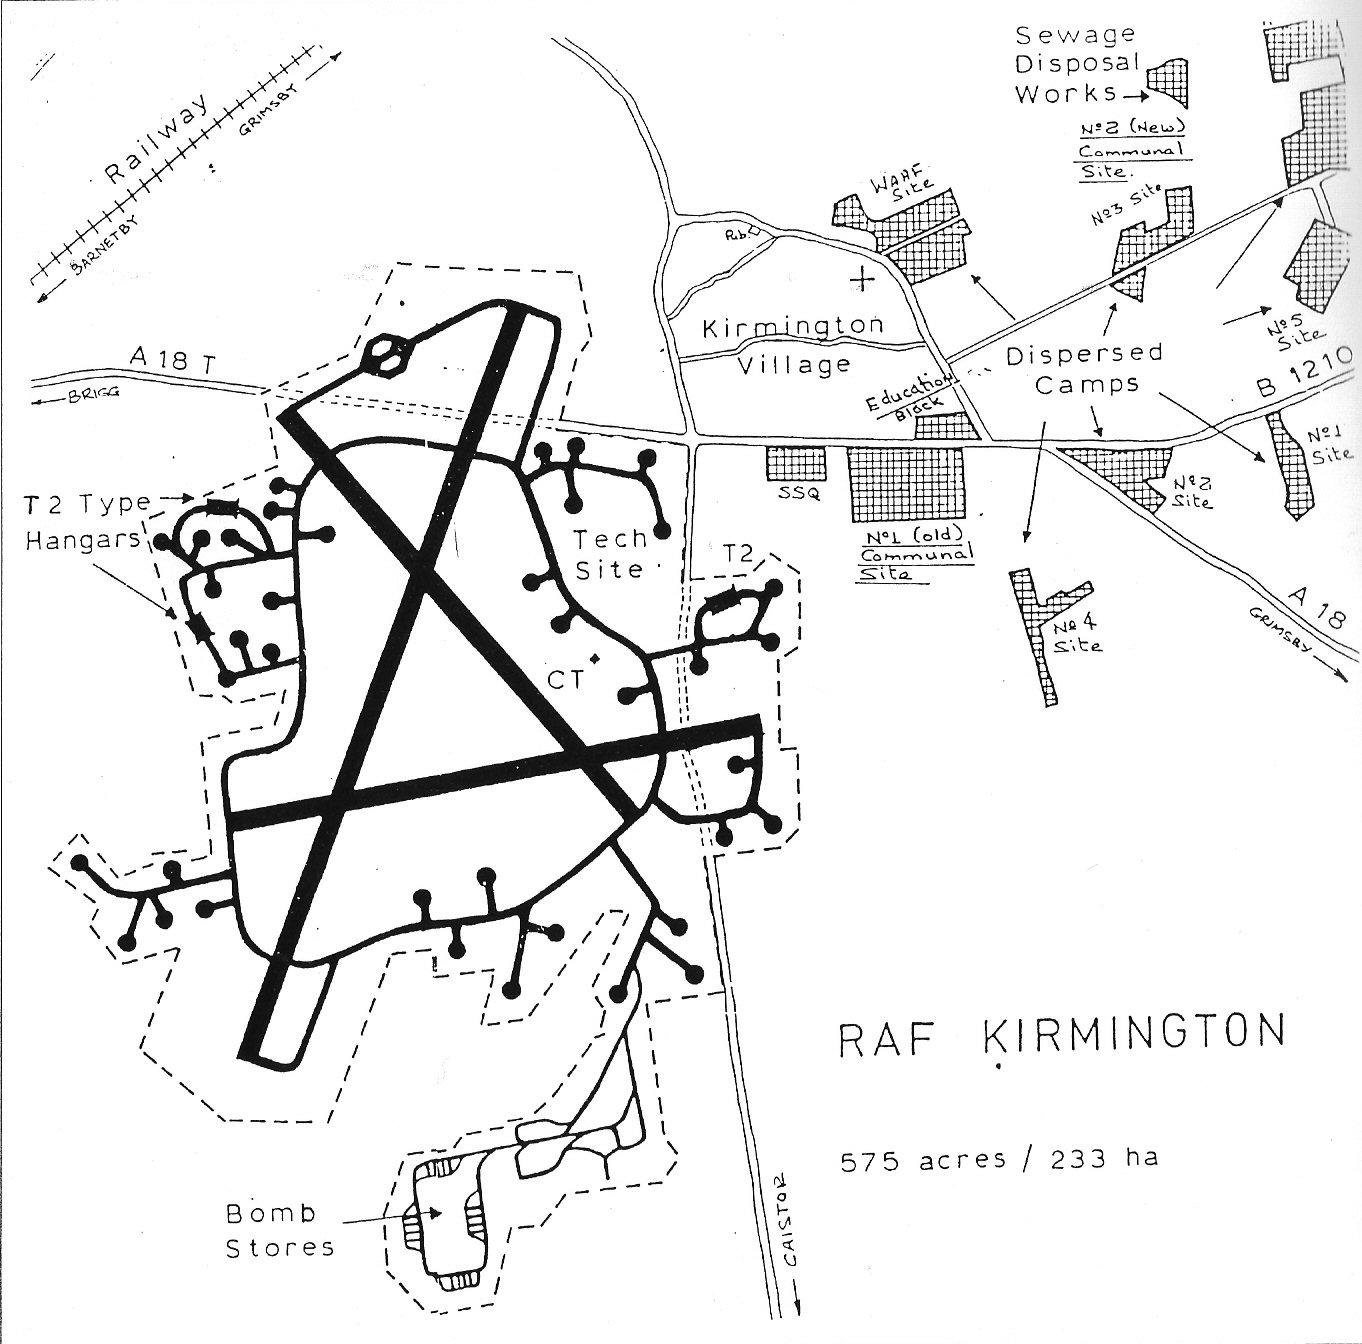 RAF_Kermington_map.jpg